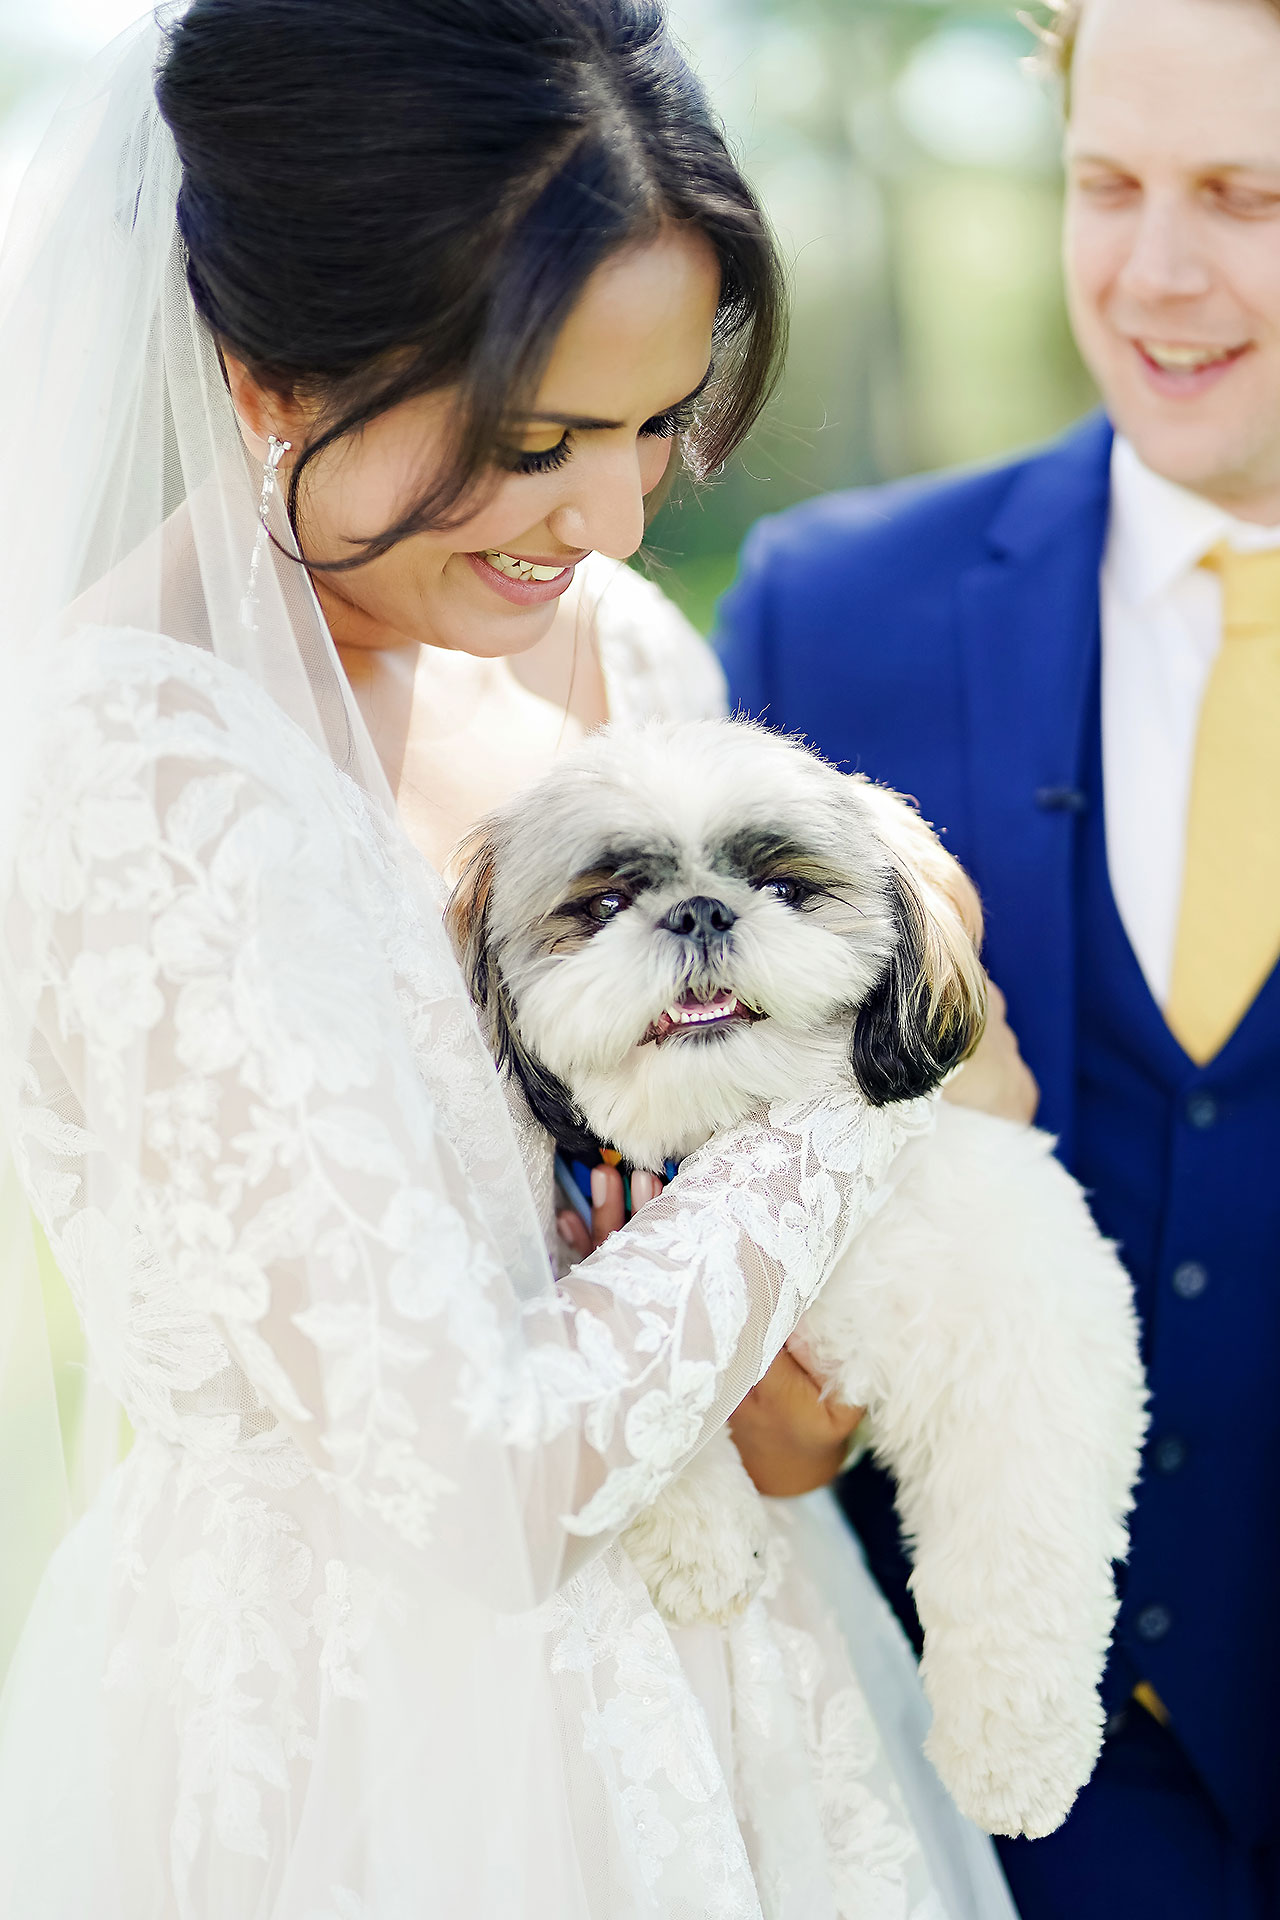 Nadia Parker Black Iris Estate Carmel Indiana Wedding May 2021 060